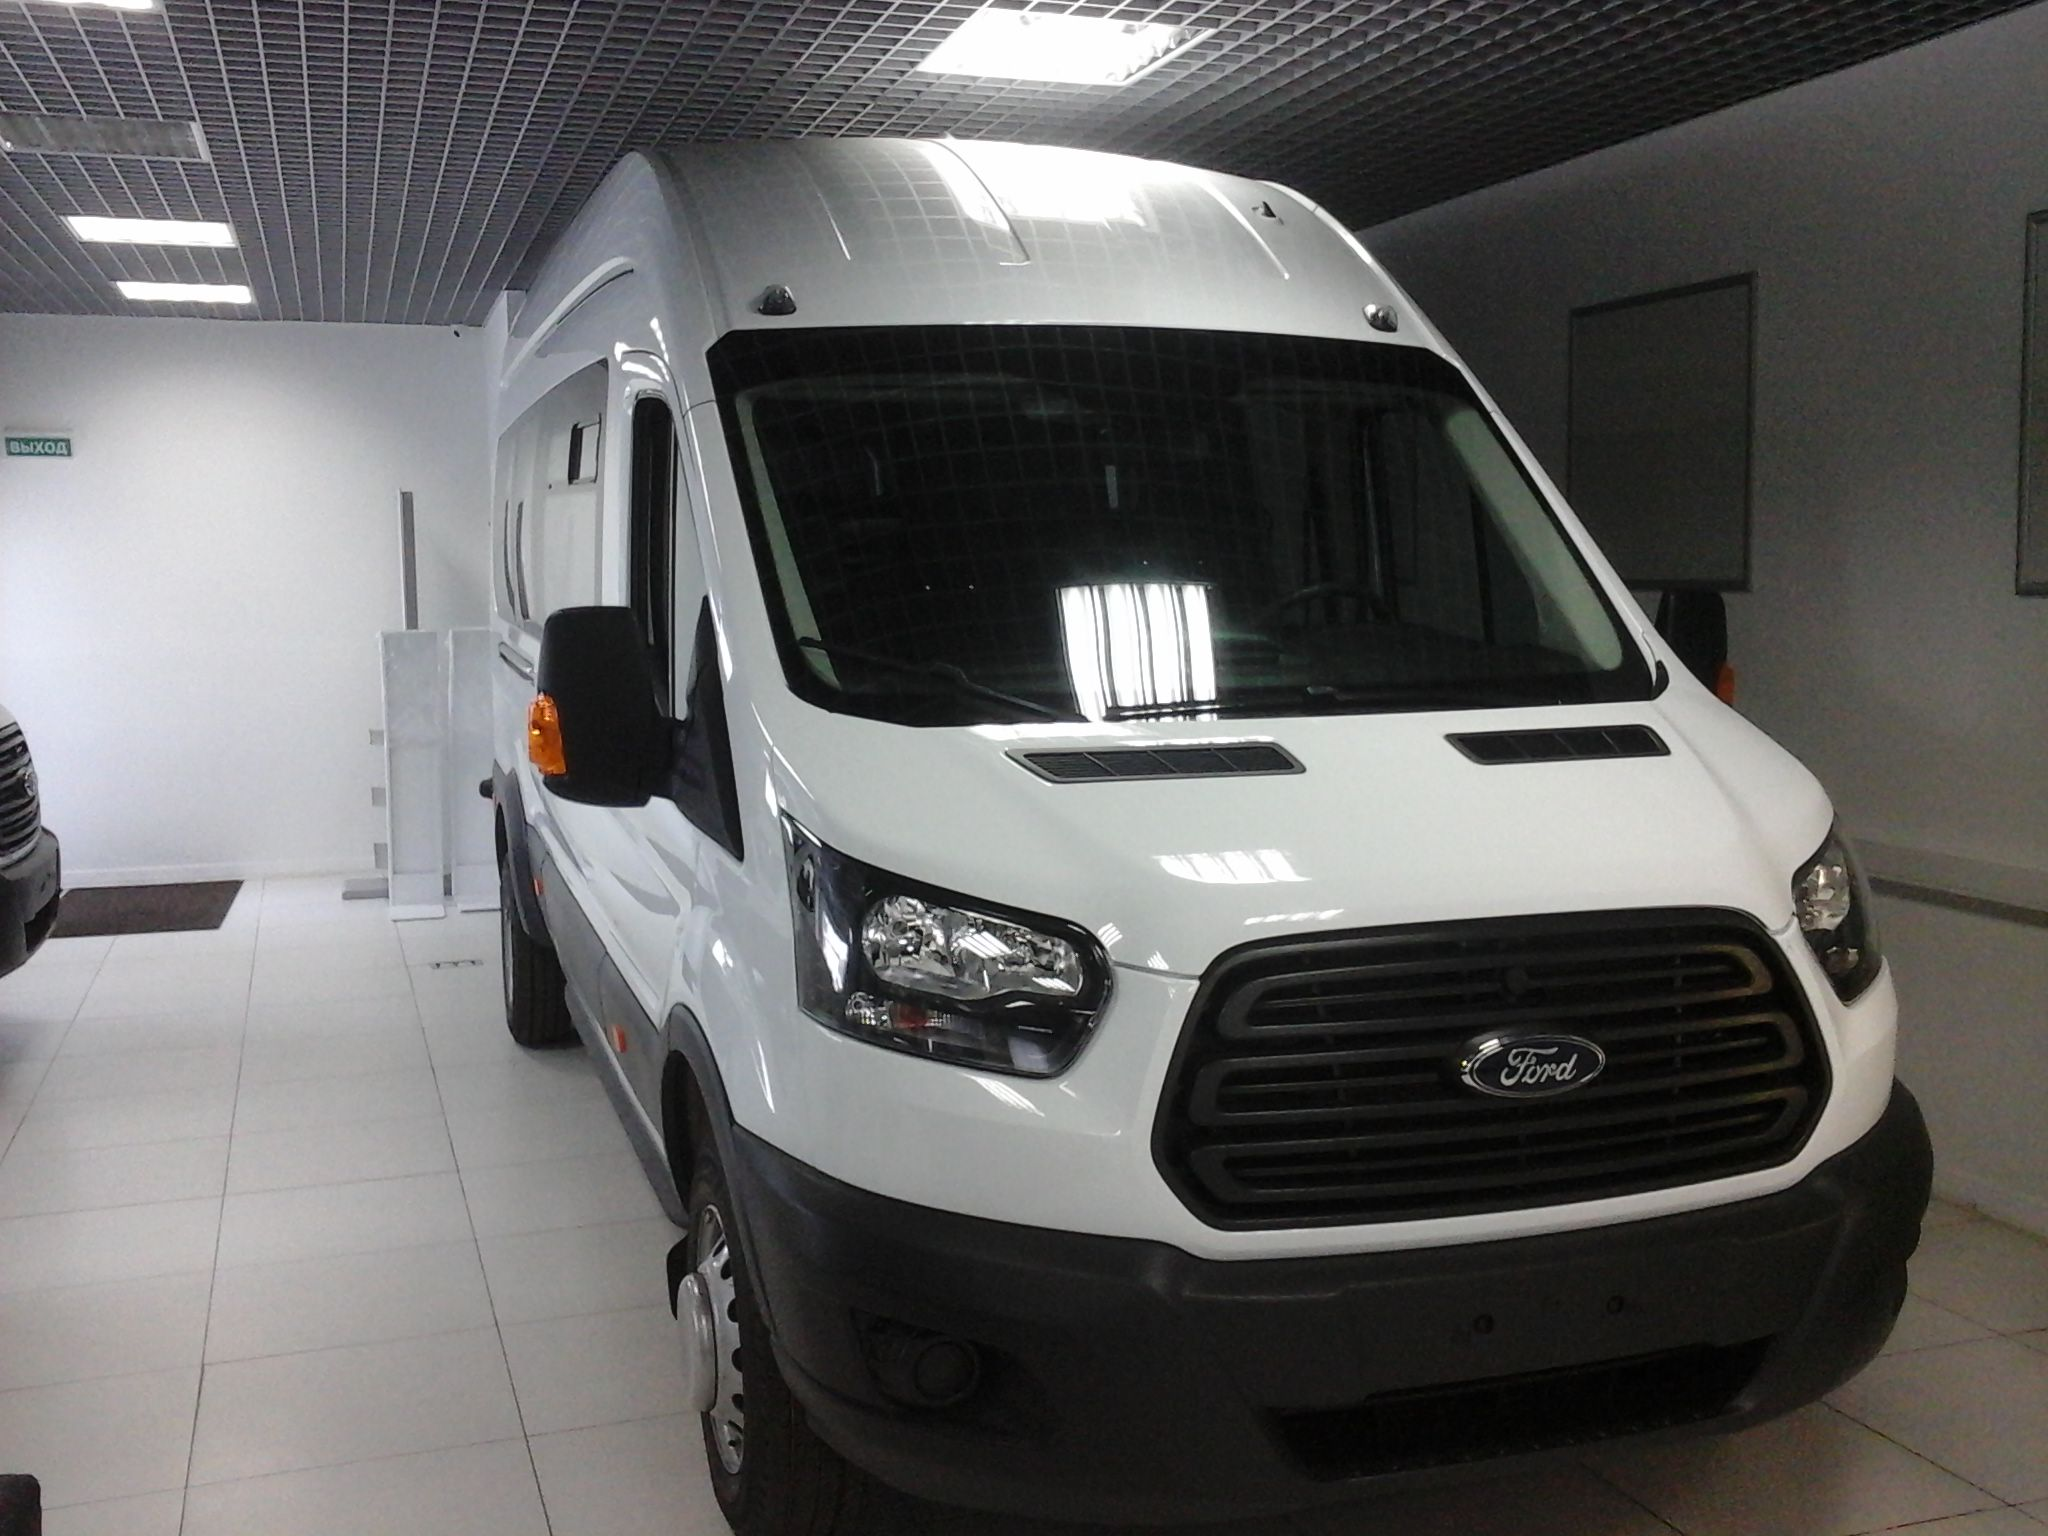 Ford Transit 171 туристический микроавтобус